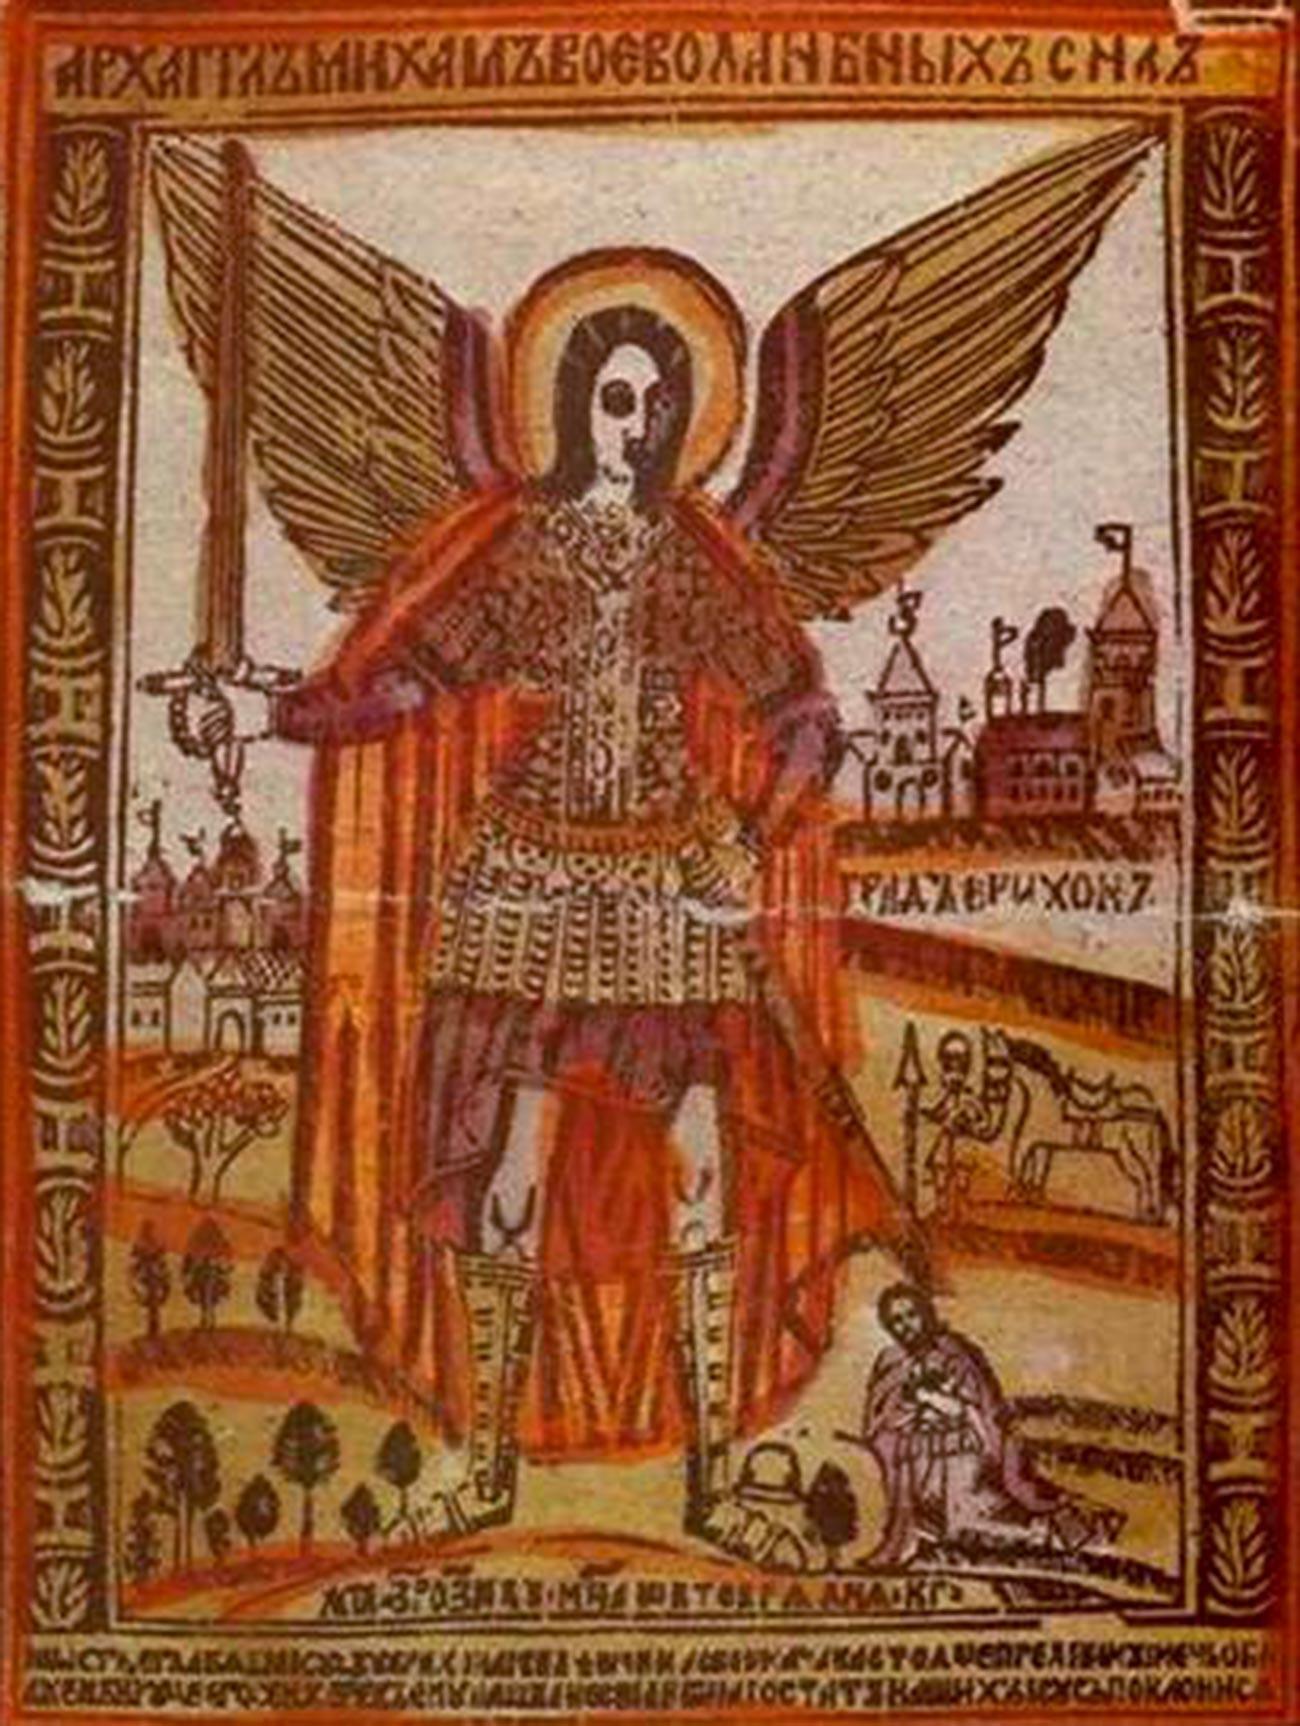 Lubok 'Archangel Mikhail', unknown author, 1668.